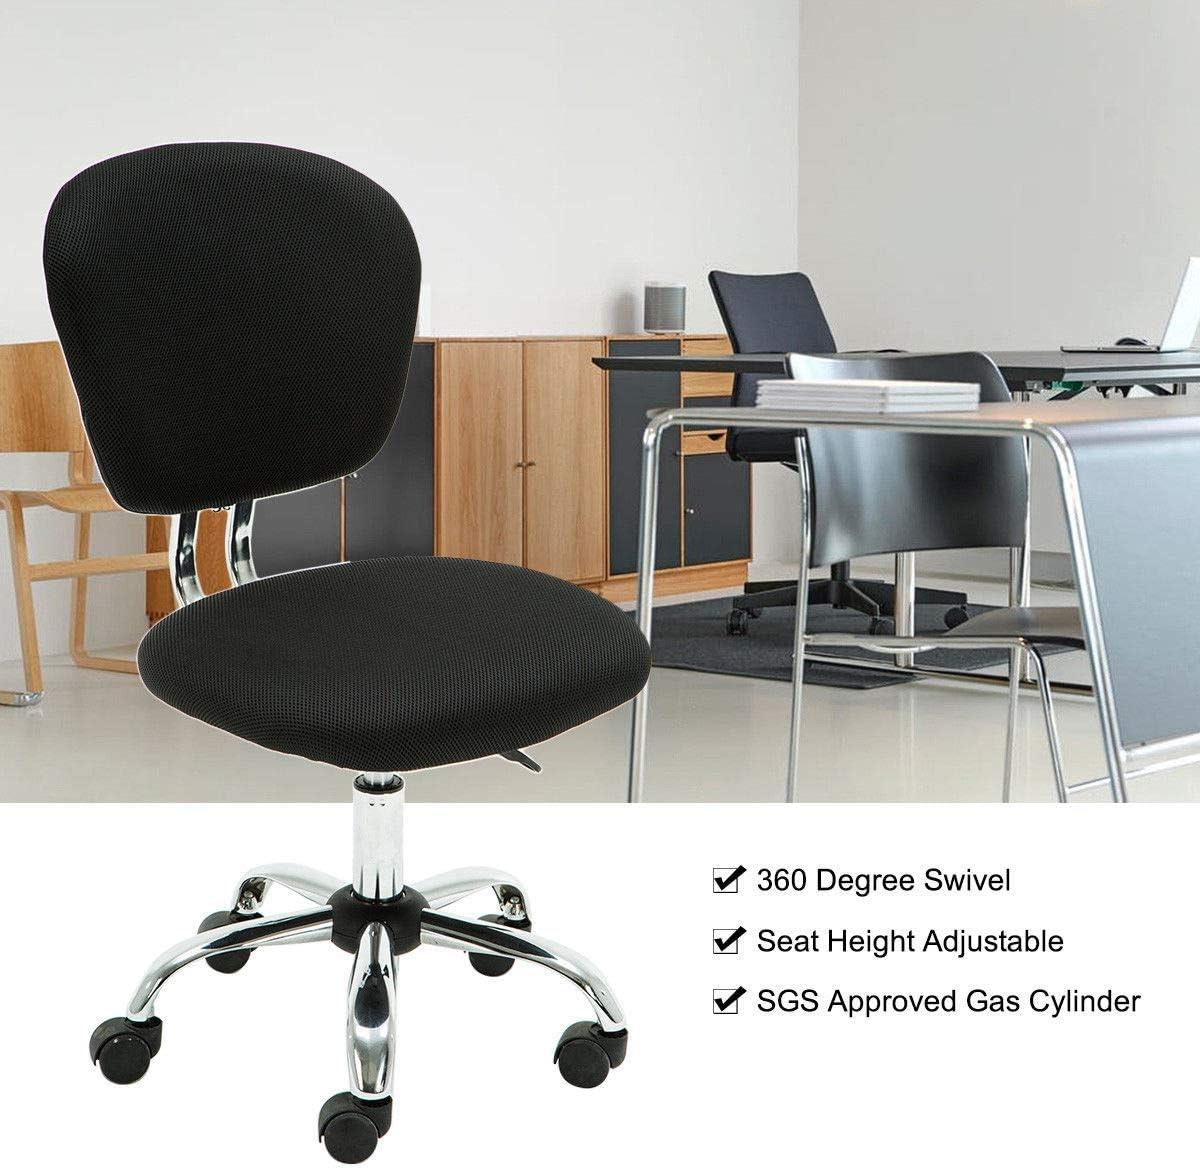 DESIGNER MESH CHROME ADJUSTABLE EXECUTIVE OFFICE COMPUTER DESK CHAIR SEAT FABRIC